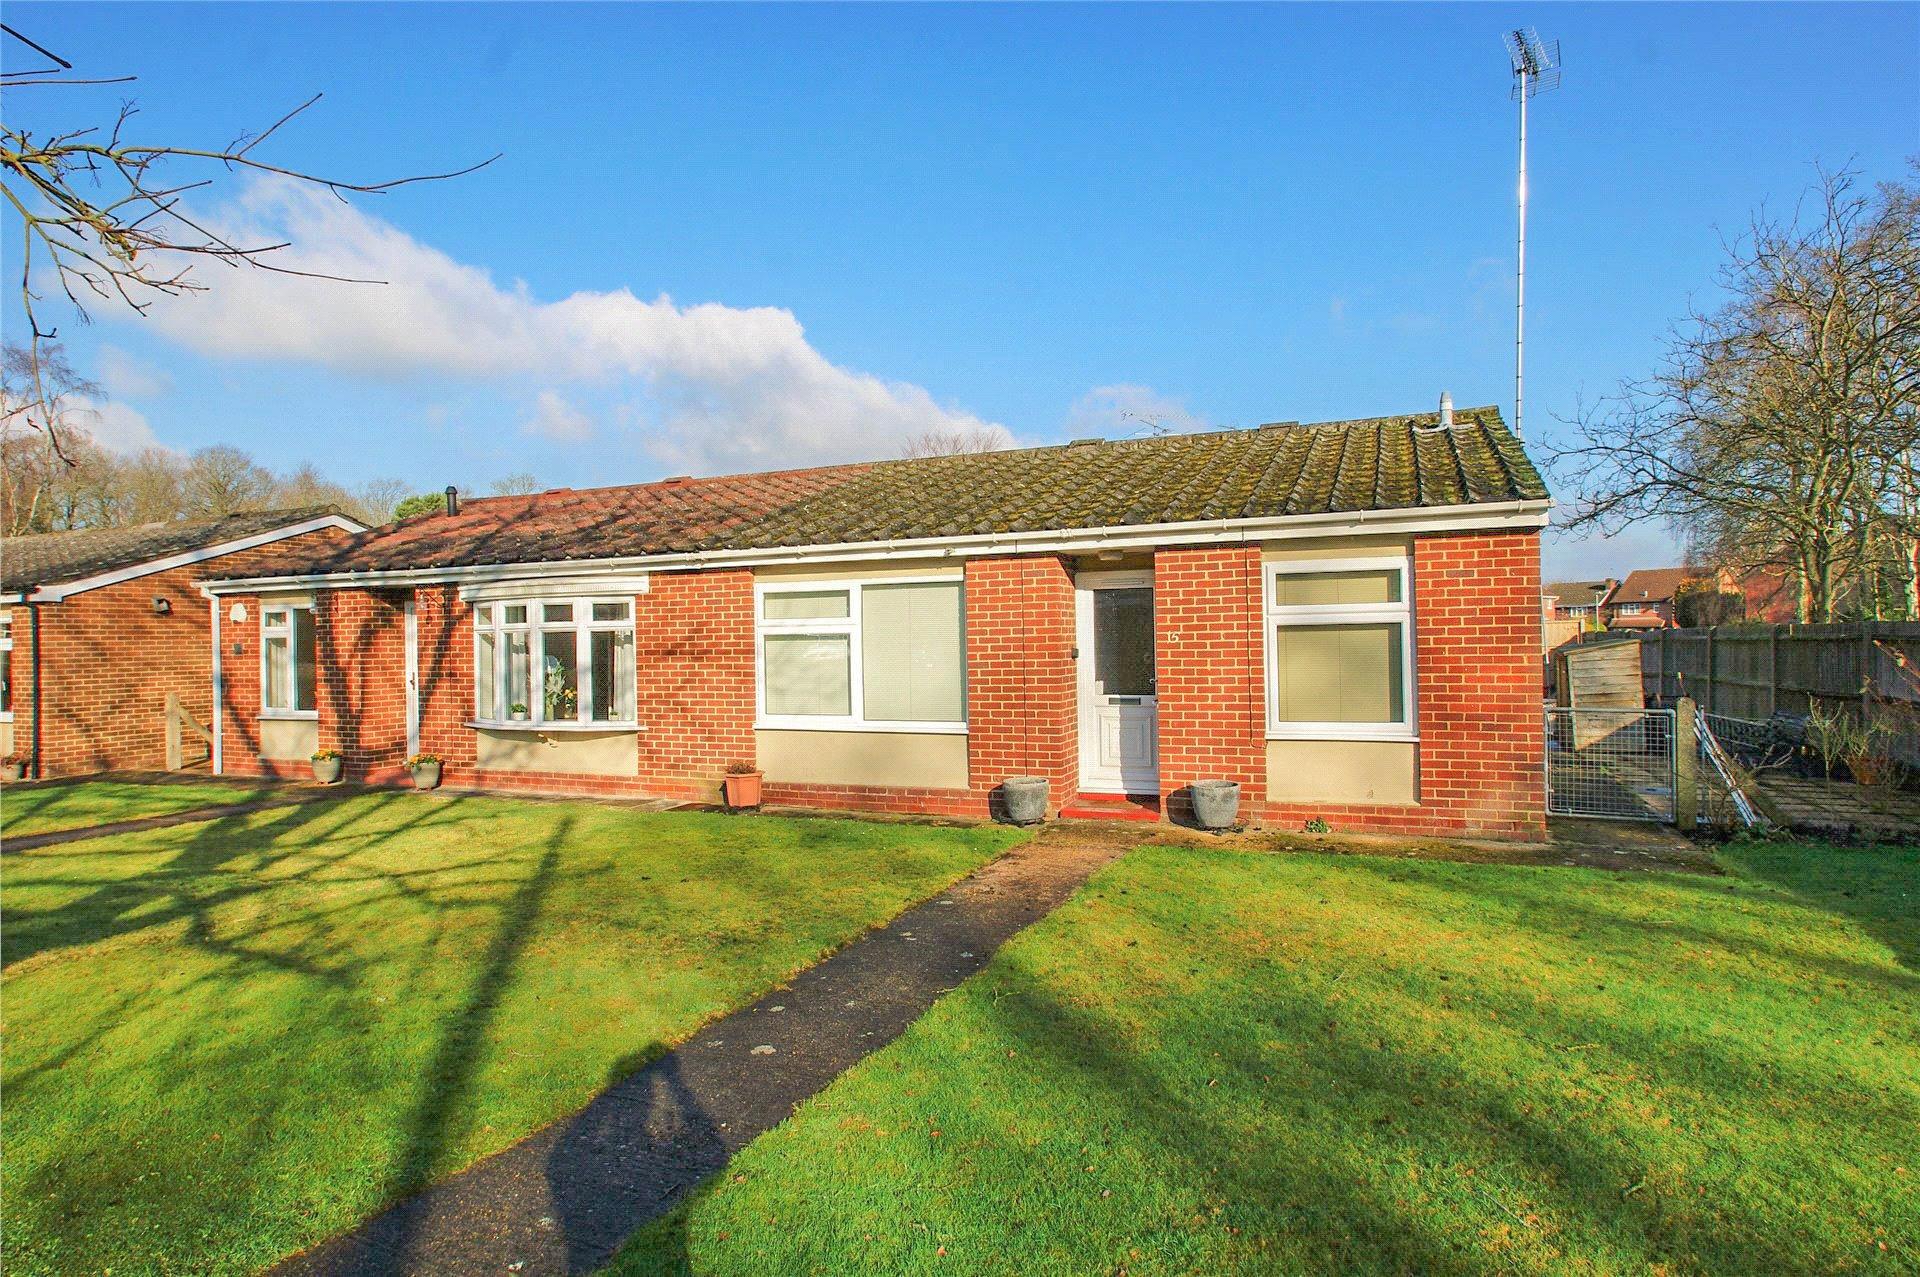 2 Bedrooms Semi Detached Bungalow for sale in Woodside Close, Finchampstead, Wokingham, Berkshire, RG40